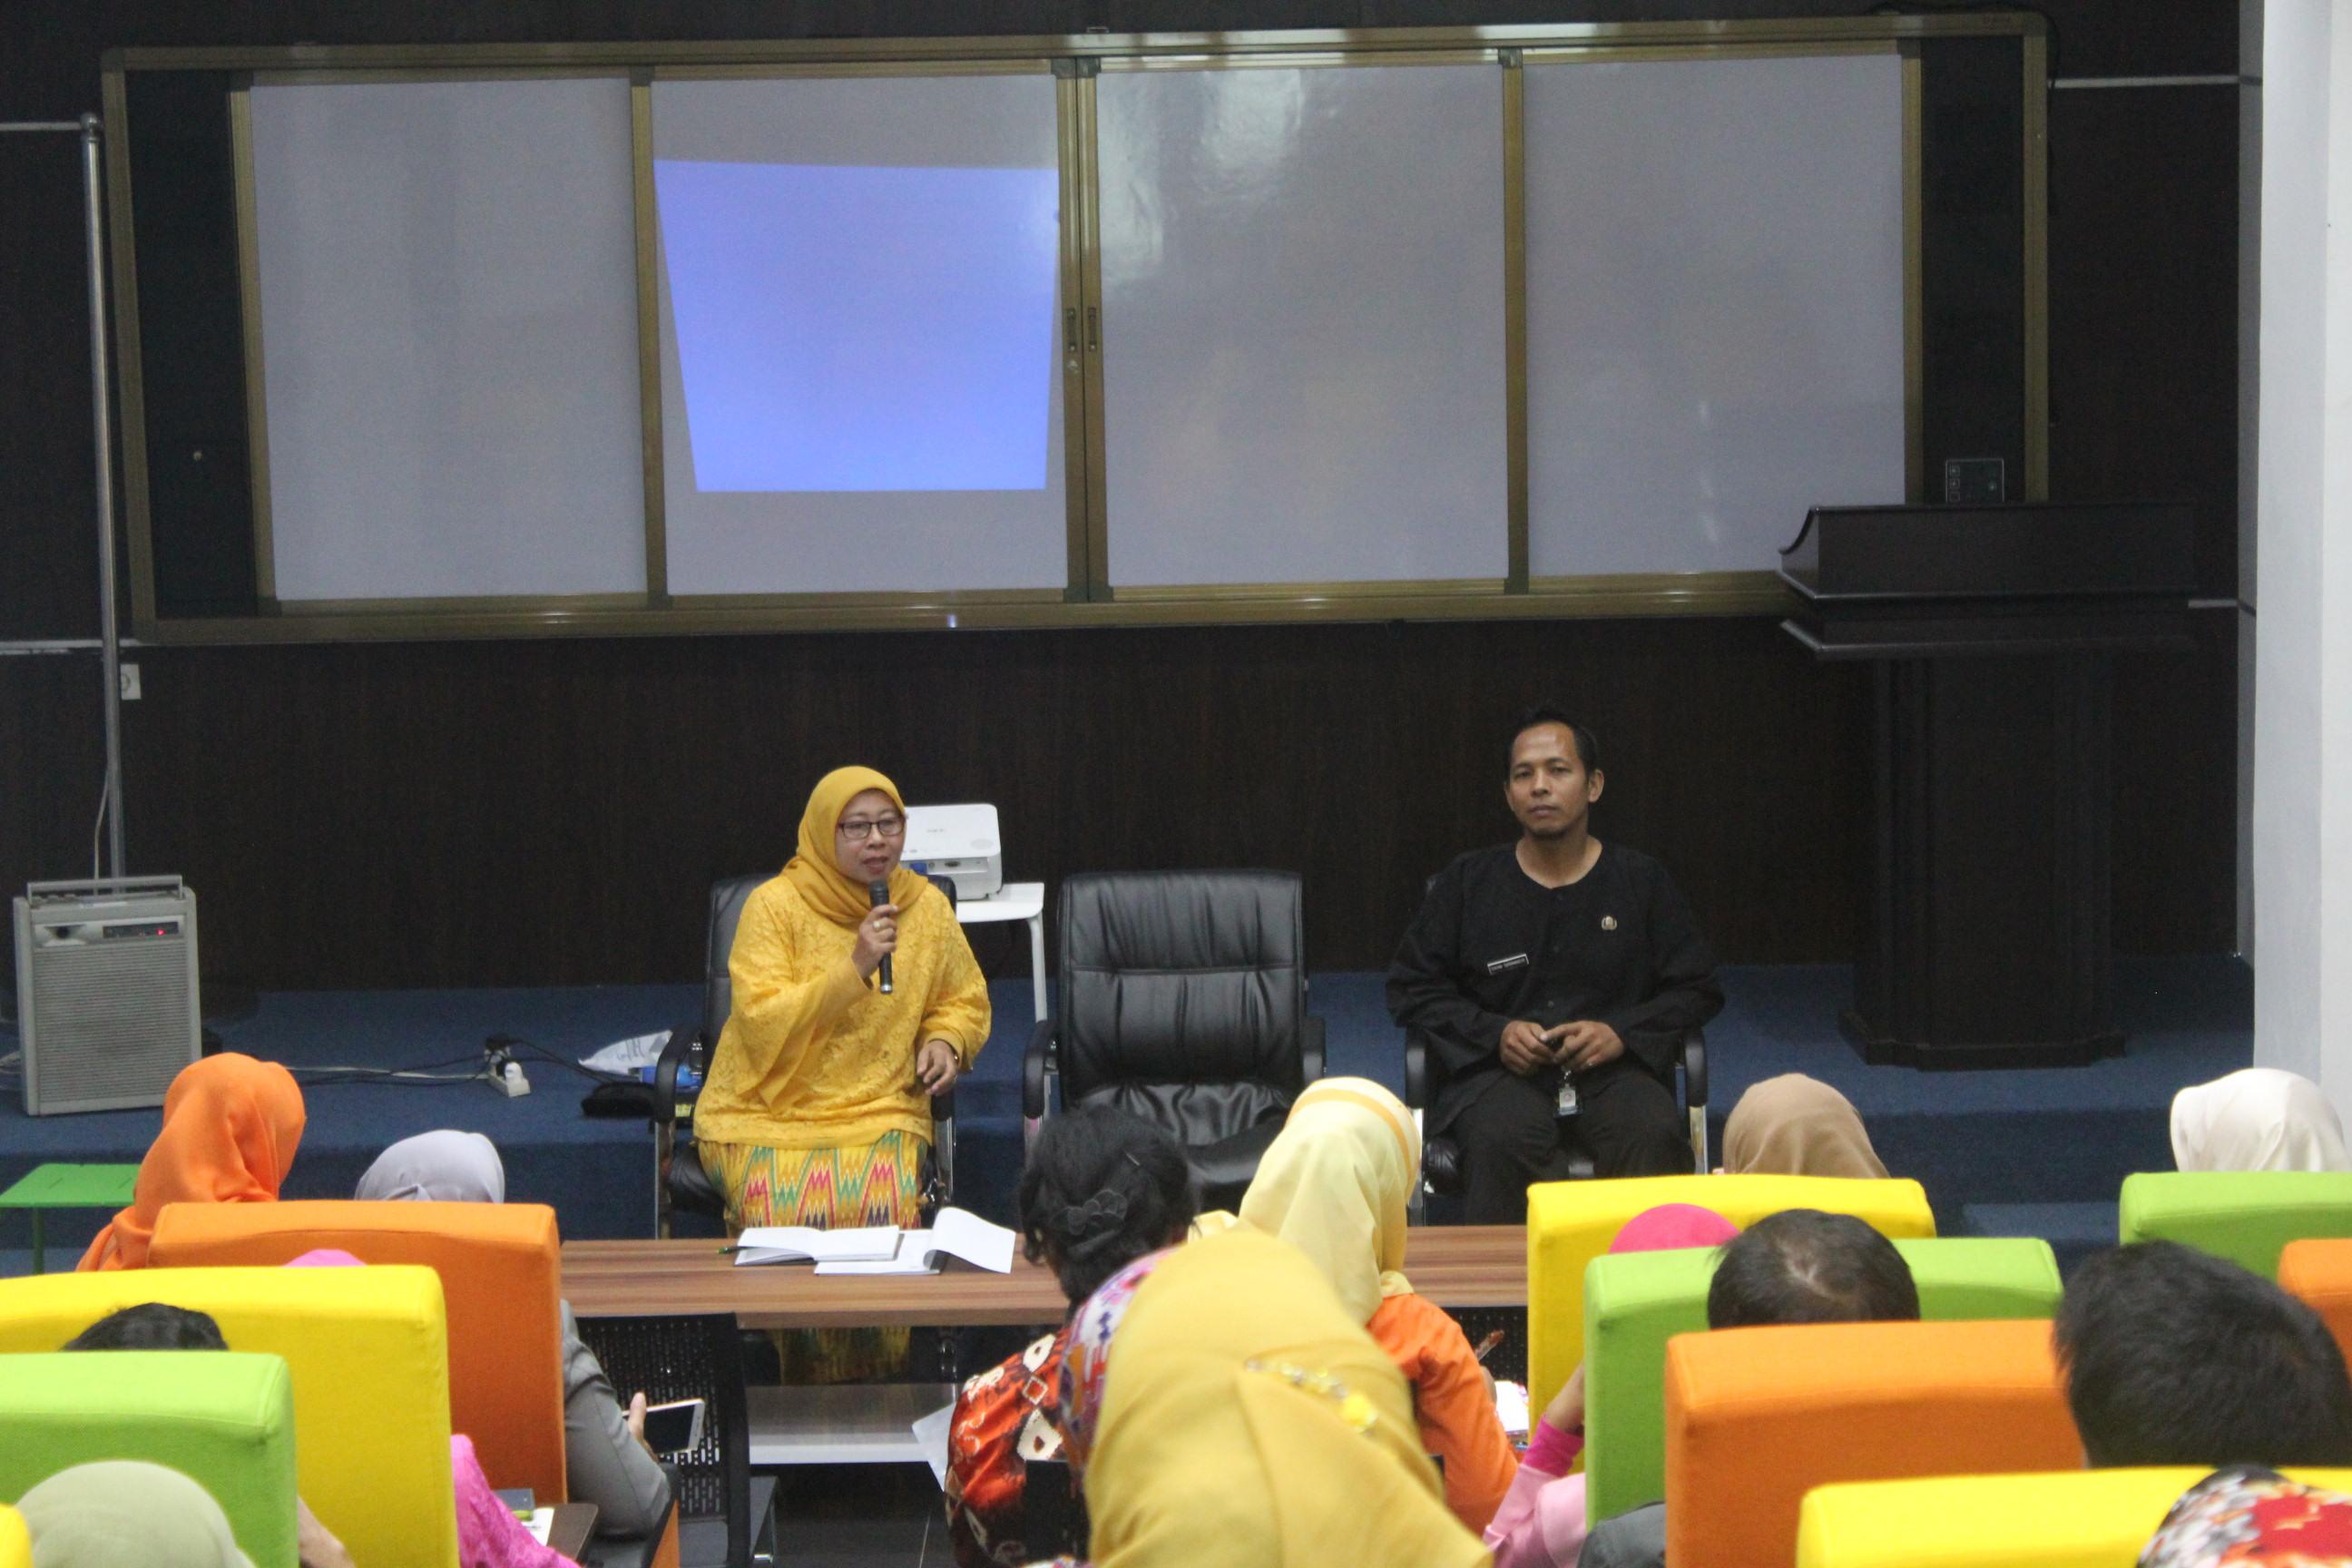 Sosialisasi Pengelolaan Perpustakaan kepada Para Pengelola Perpustakaan Sekolah Tingkat SMP Negeri se-Kota Bandung